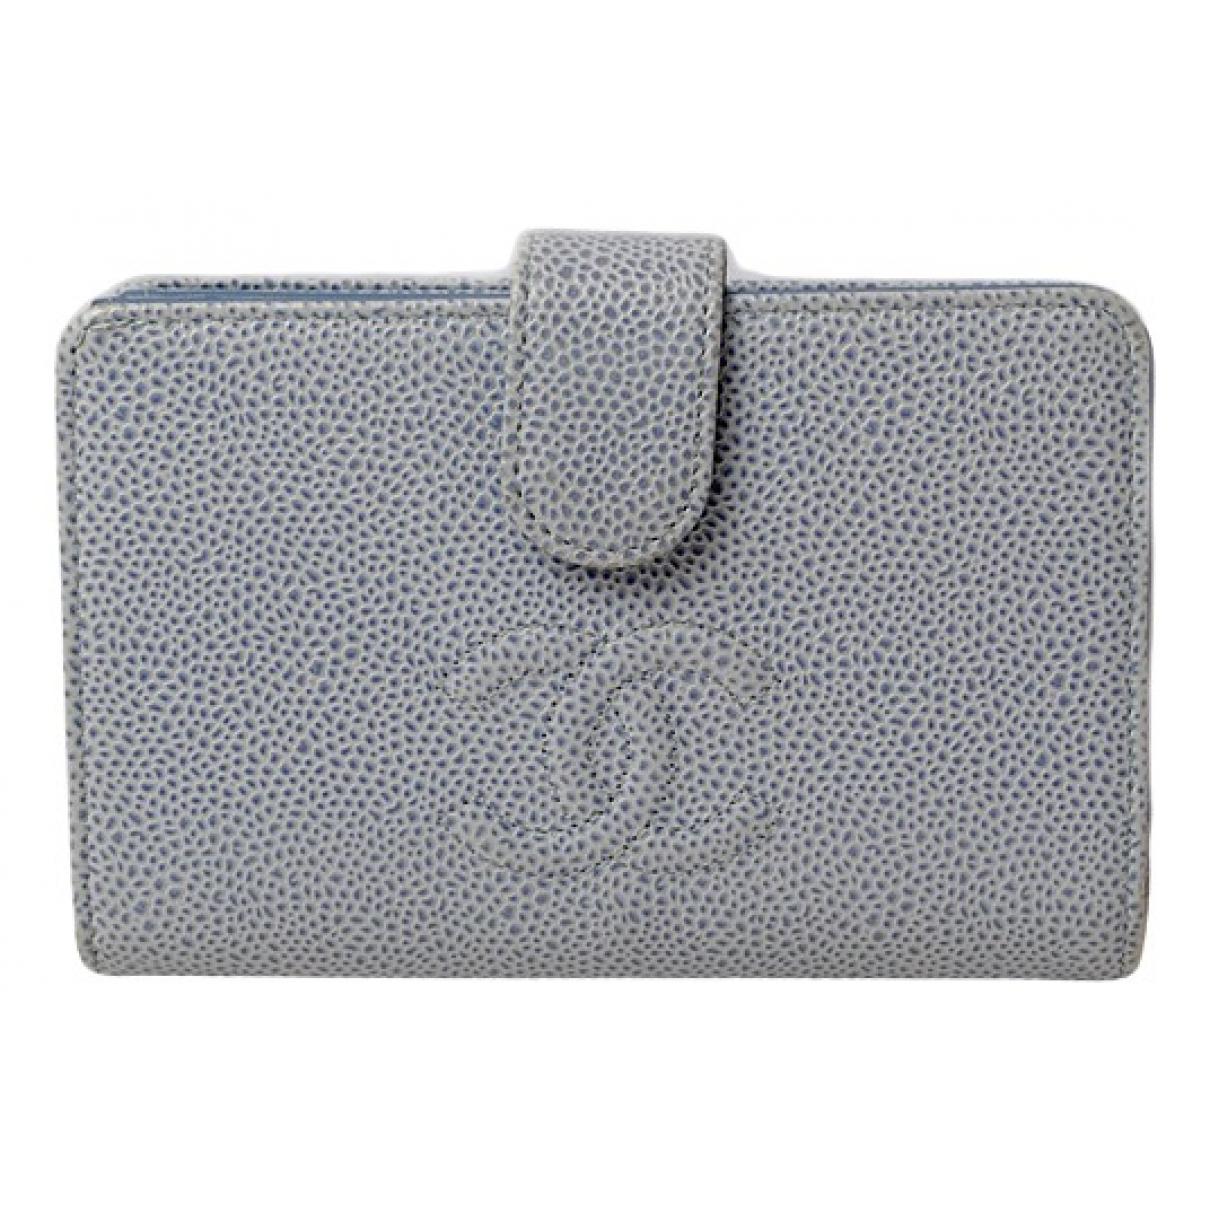 Chanel \N Blue Leather wallet for Women \N